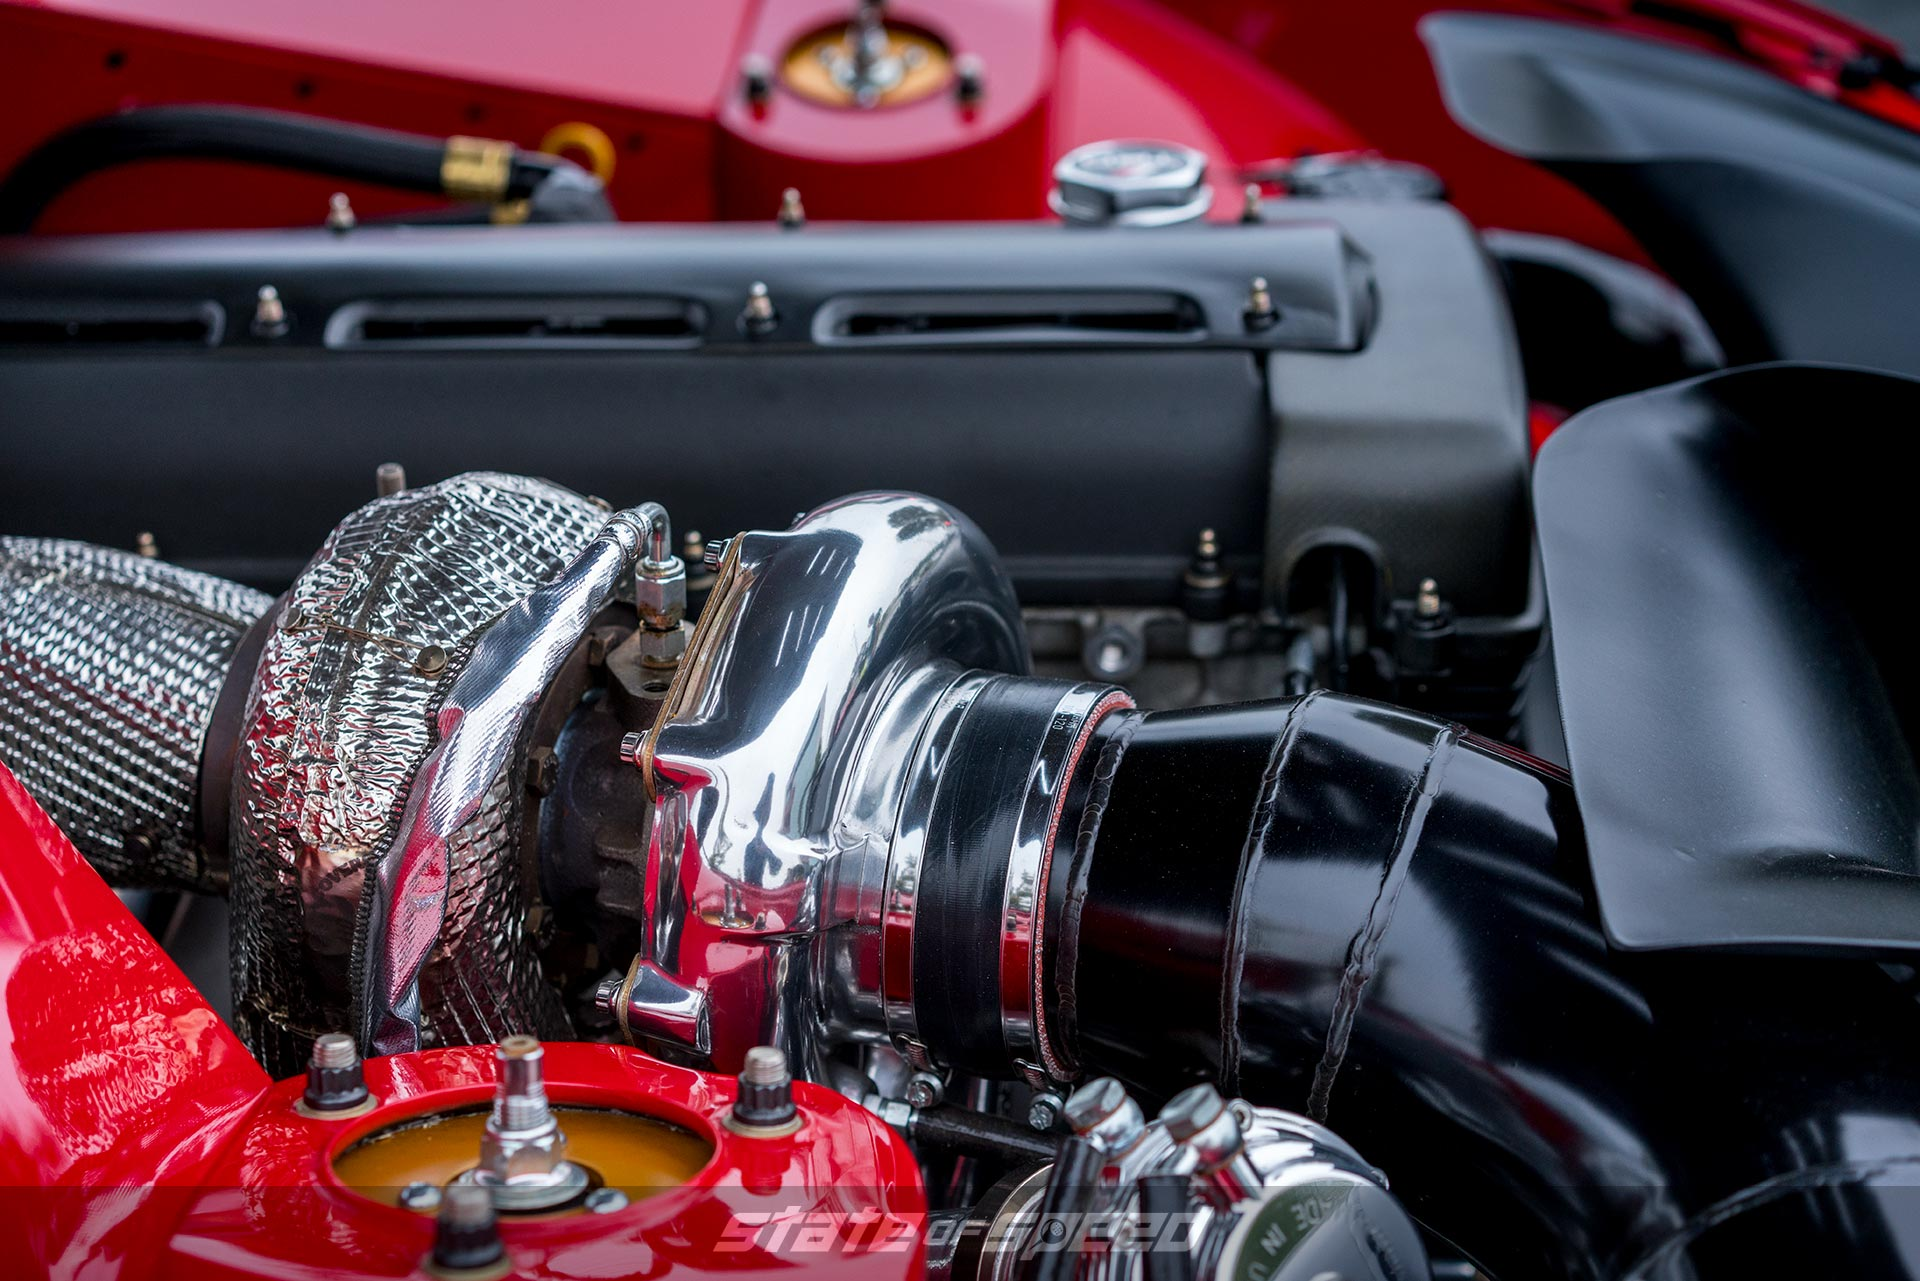 Toyota Supra with turbo